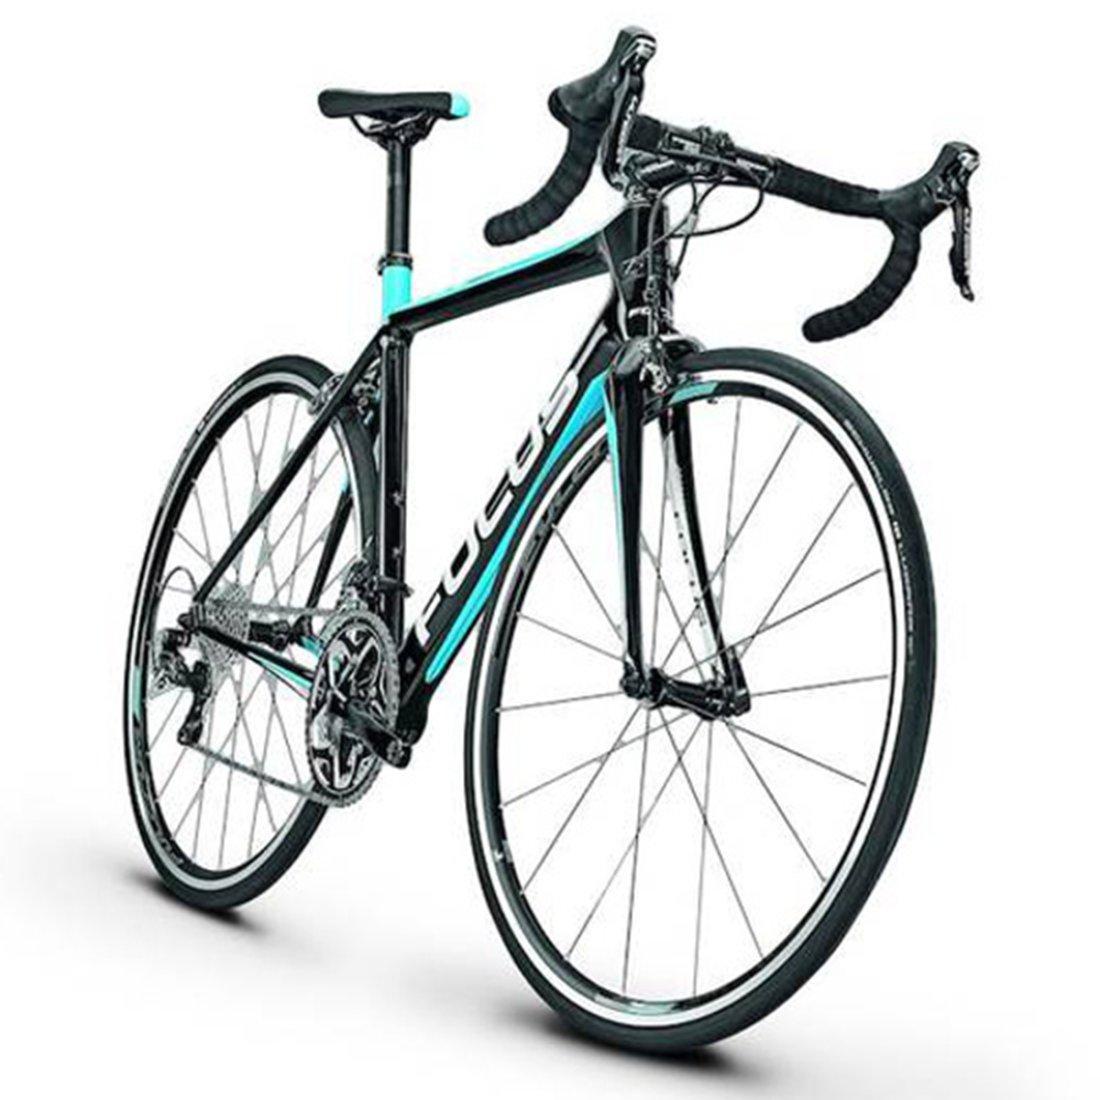 Focus Cayo Ultegra Mix 2017 Carbon Blue Road Bike Motocard